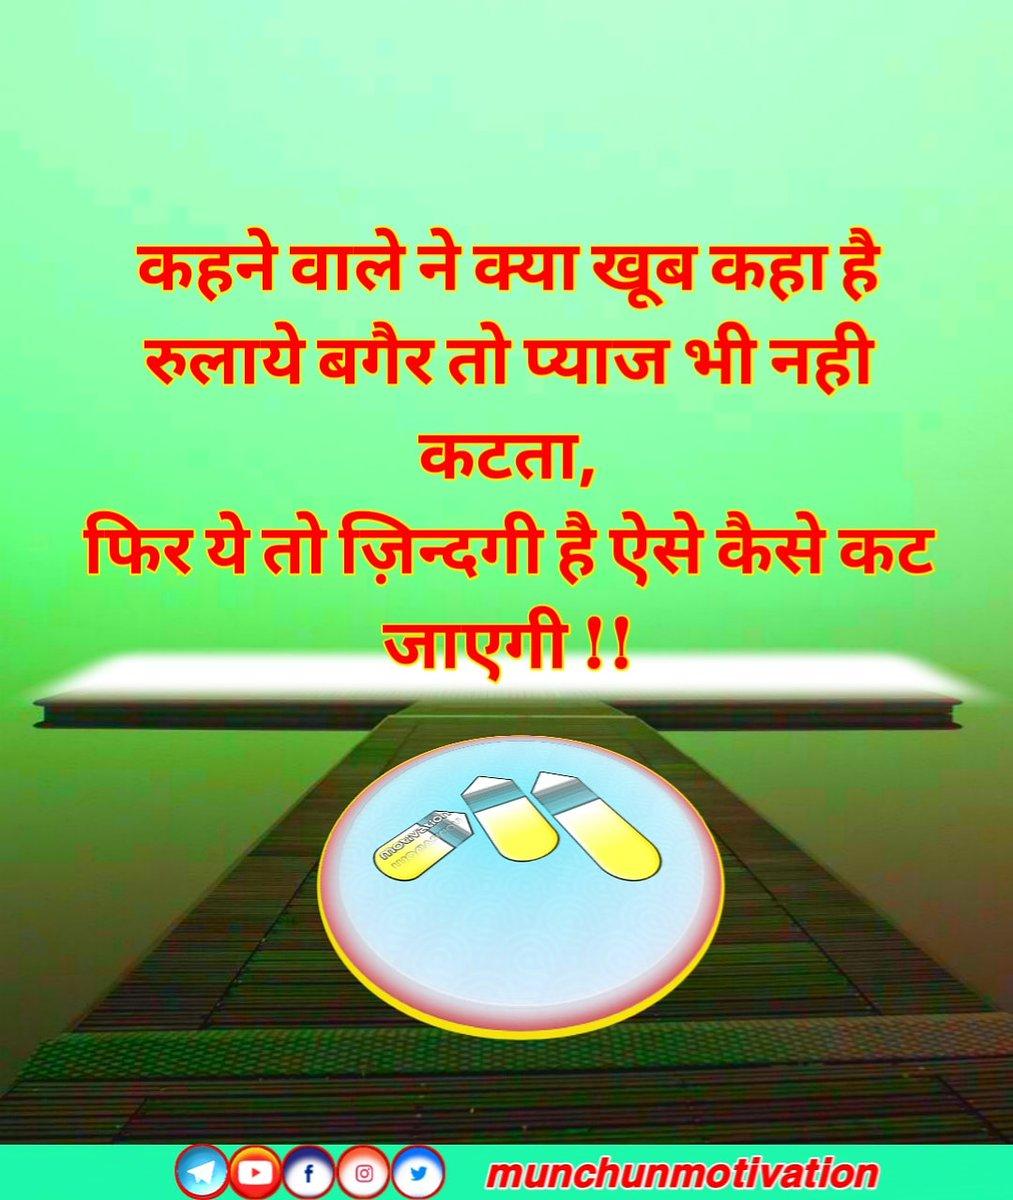 Motivation Quotes. #goodmorning #goodmorningpost #motivationquote #motivation #munchunmotivate #bestquotes #bestmotivation #suvichar #lifelesson #life #sikh #bestmotivationalquotes #motivationalquotes #indianmotivation #hindimotivationalquotes #hindimotivationpic.twitter.com/bhnzBhQB7V